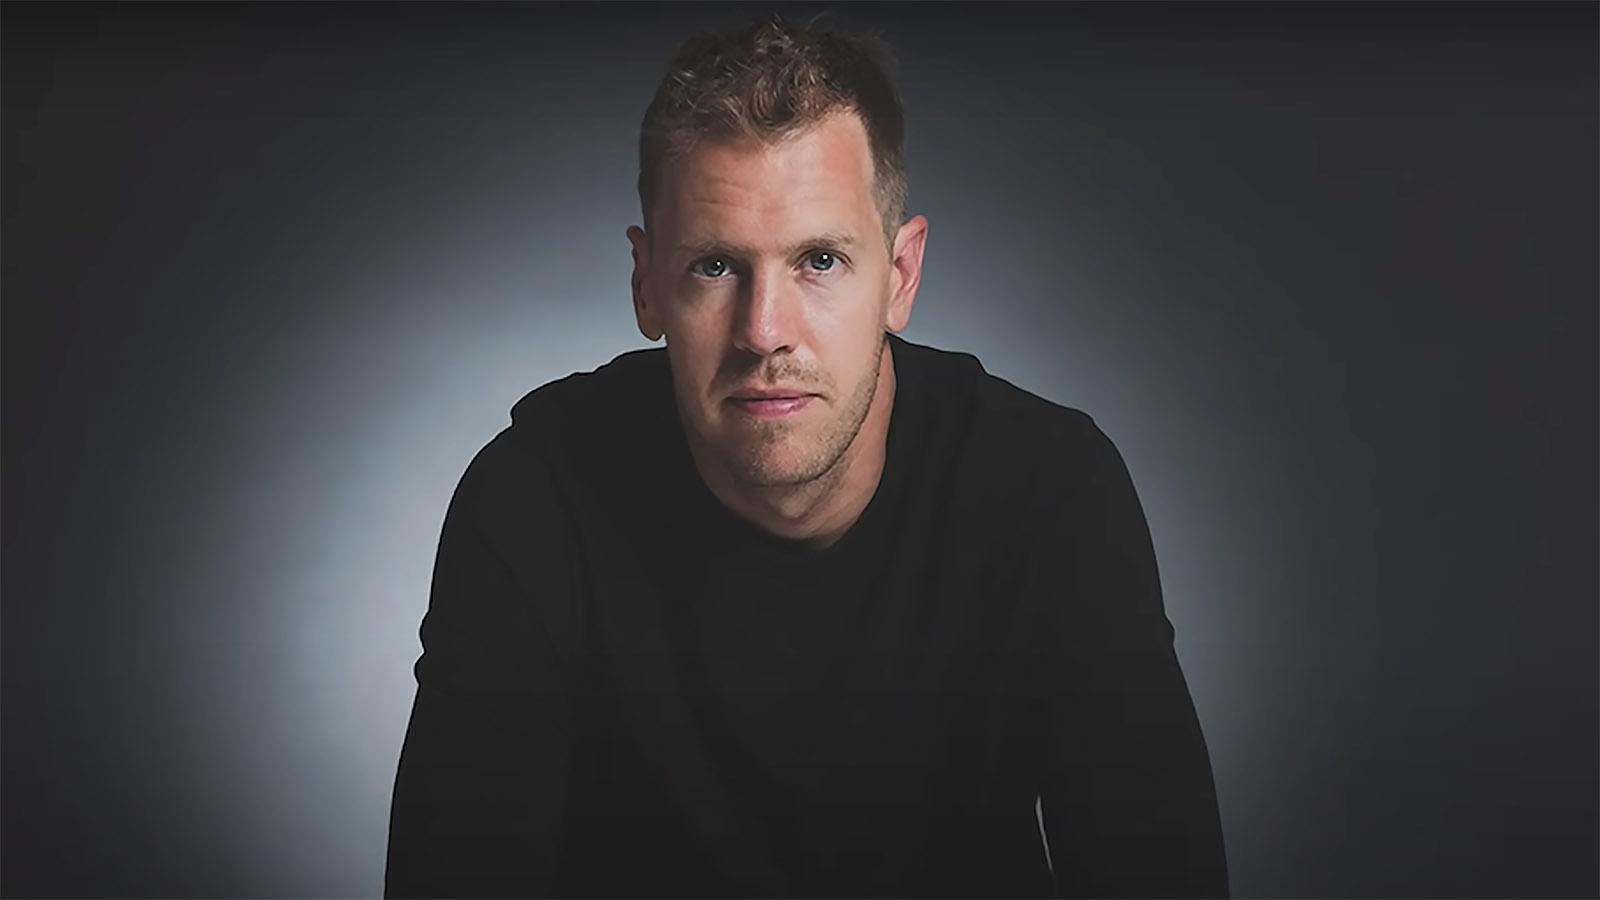 Sebastian Vettel F1 driver